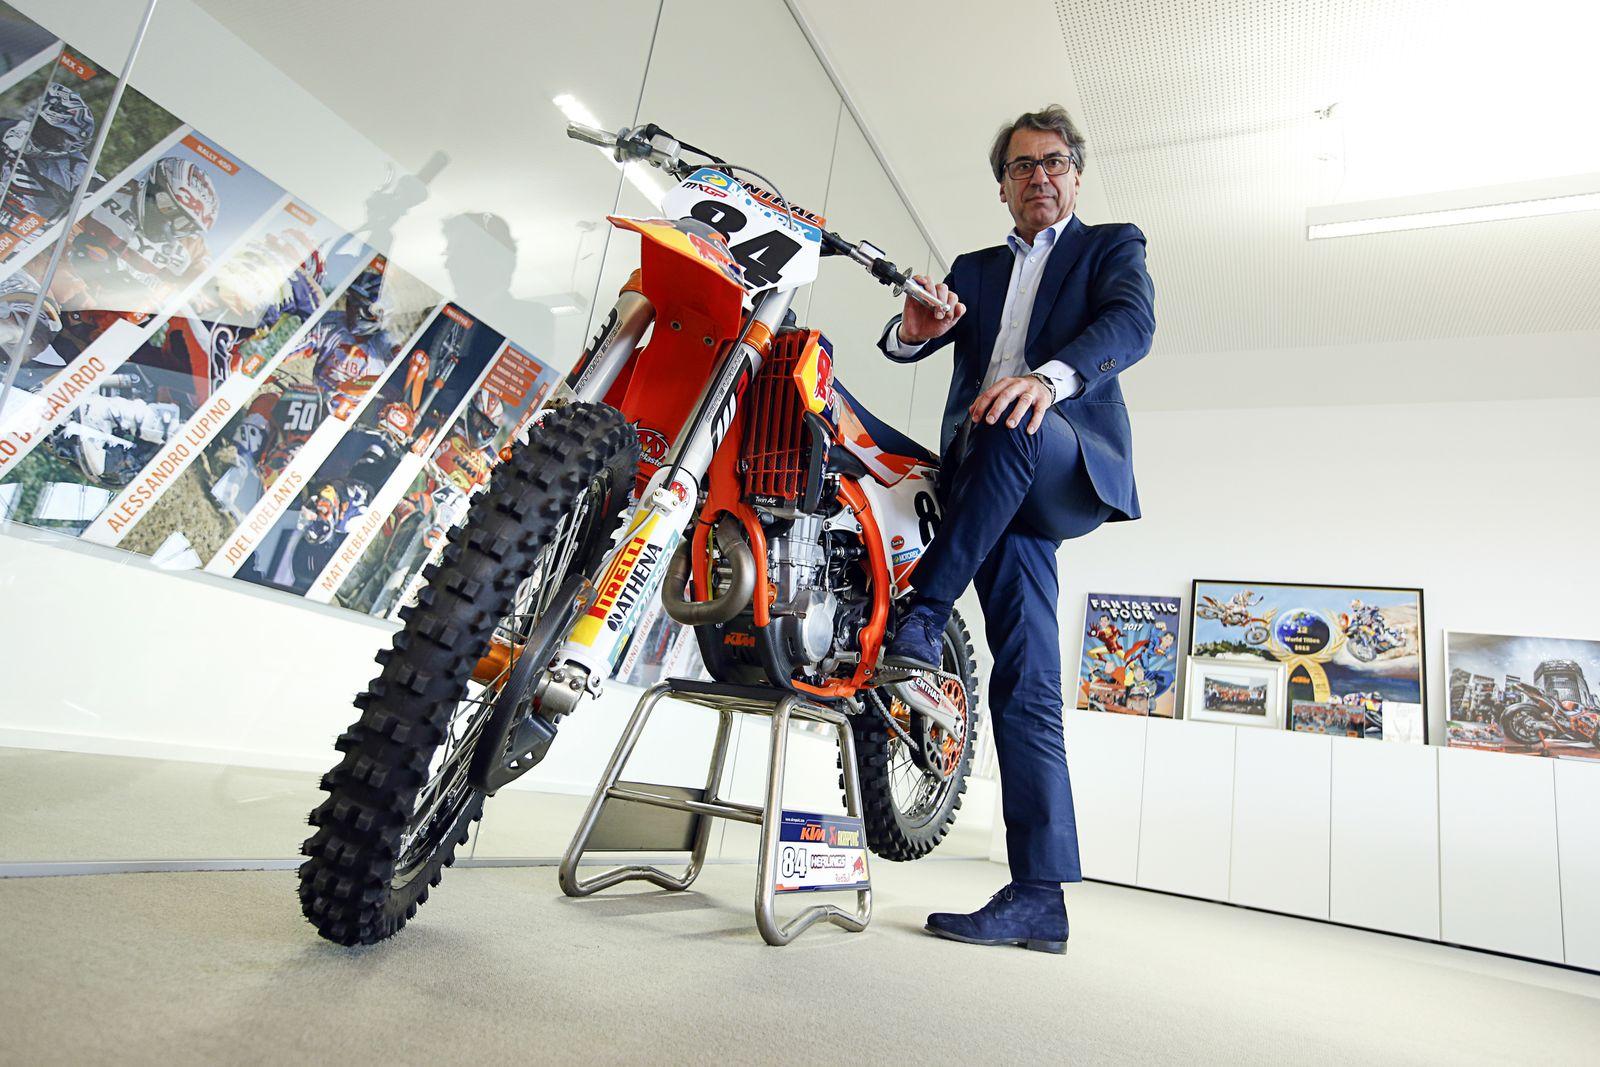 KTM Rides To $1 Billion Motorcycle Fortune